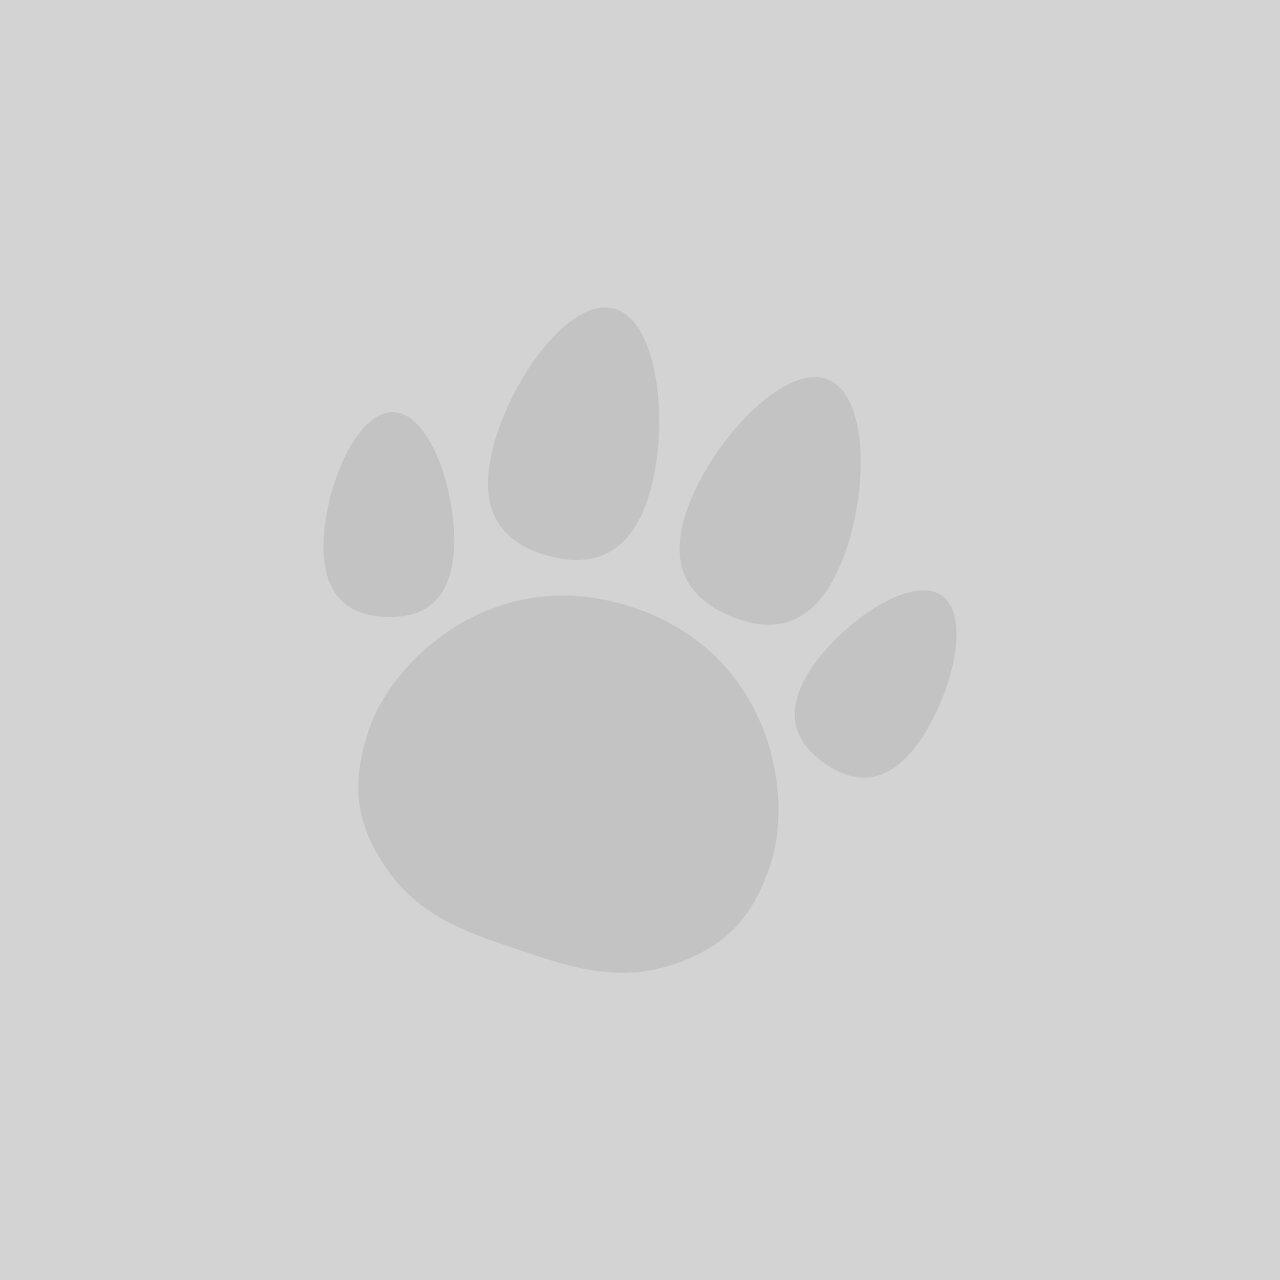 Greenies Grain Free Petite Dog Dental Treat 170g